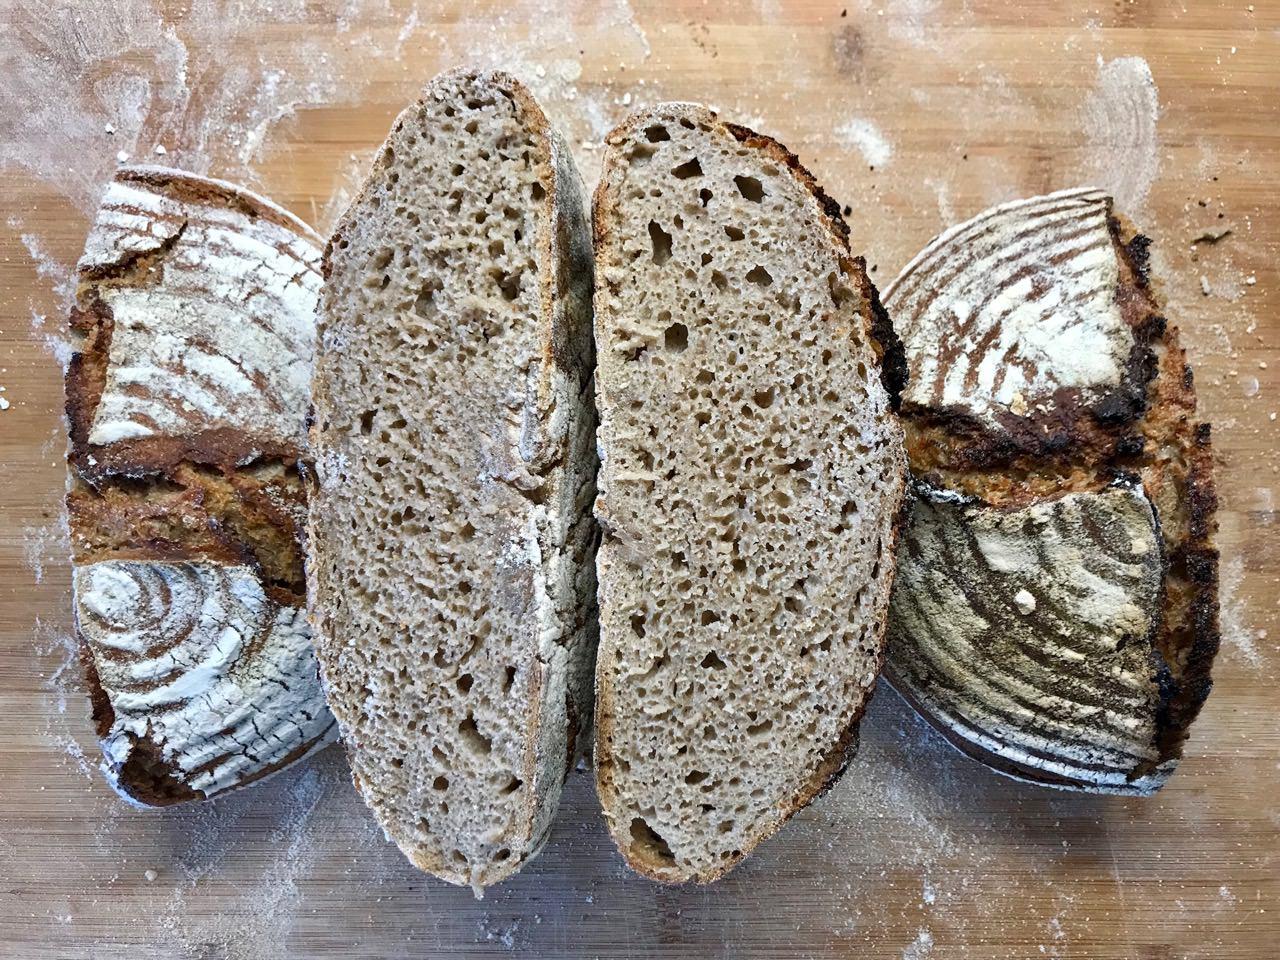 A nice and yummy sourdough bread